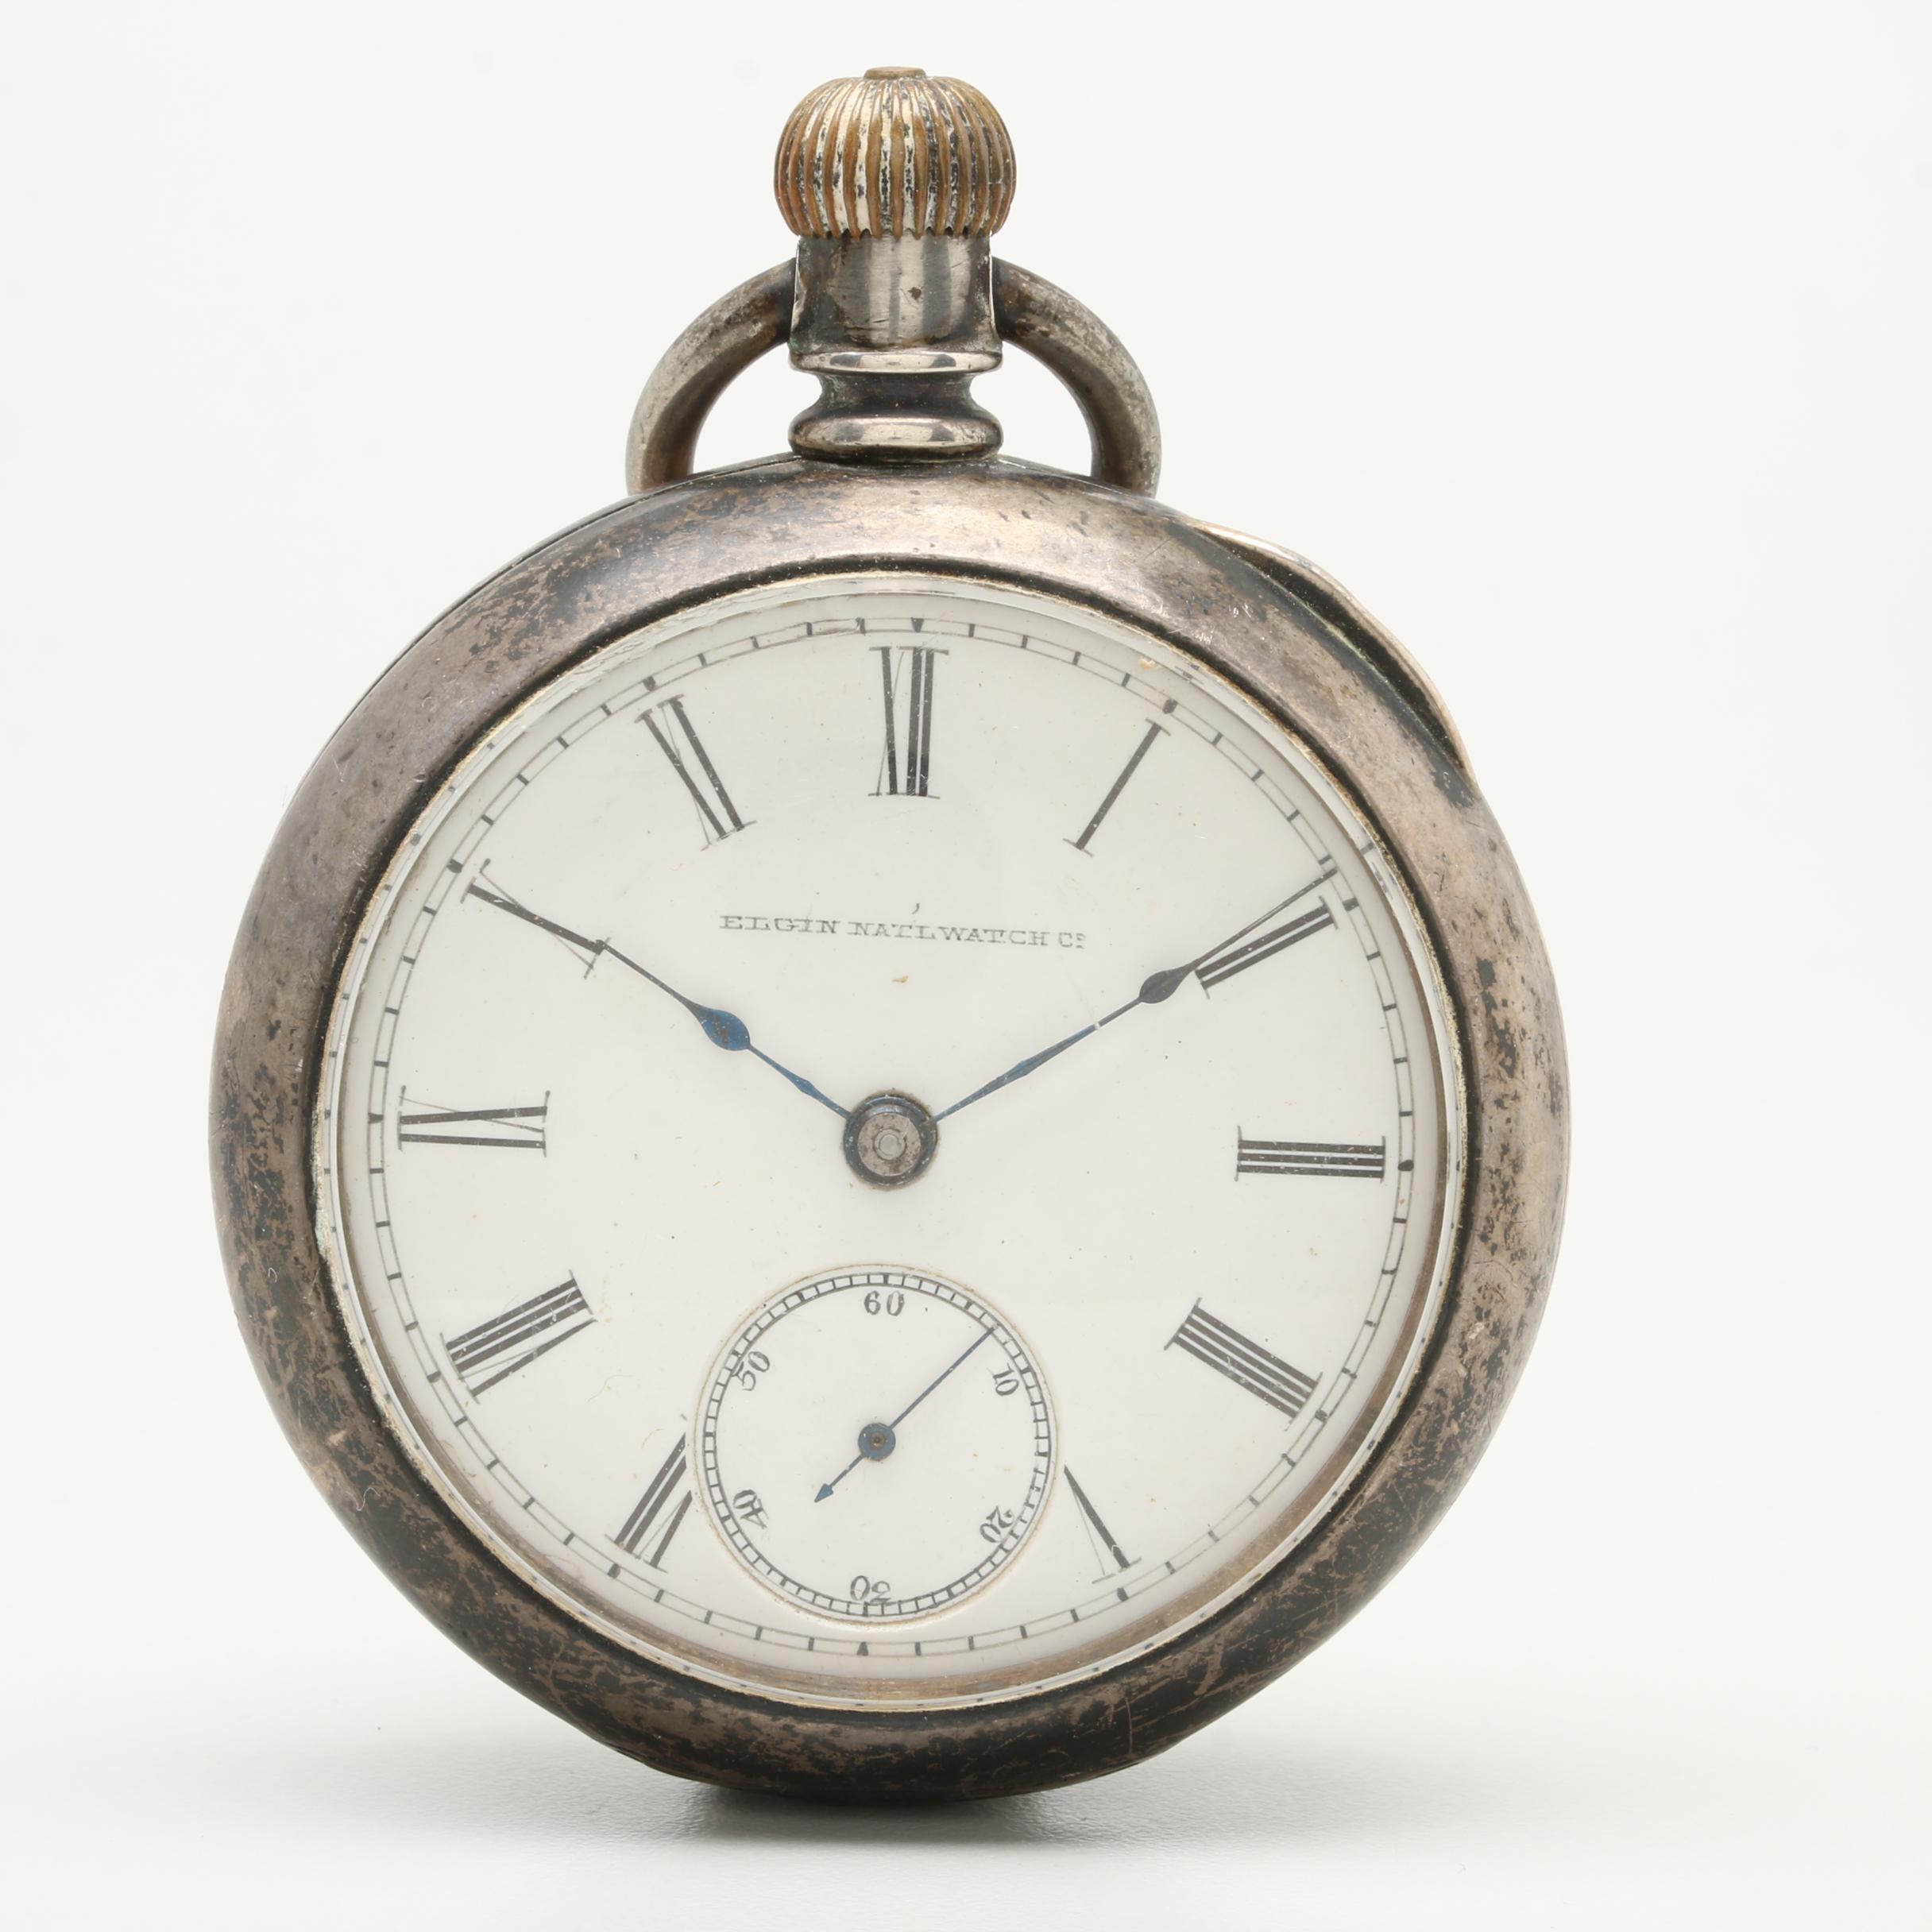 Circa 1887 Elgin Nickel and Coin Silver Double Case Pocket Watch